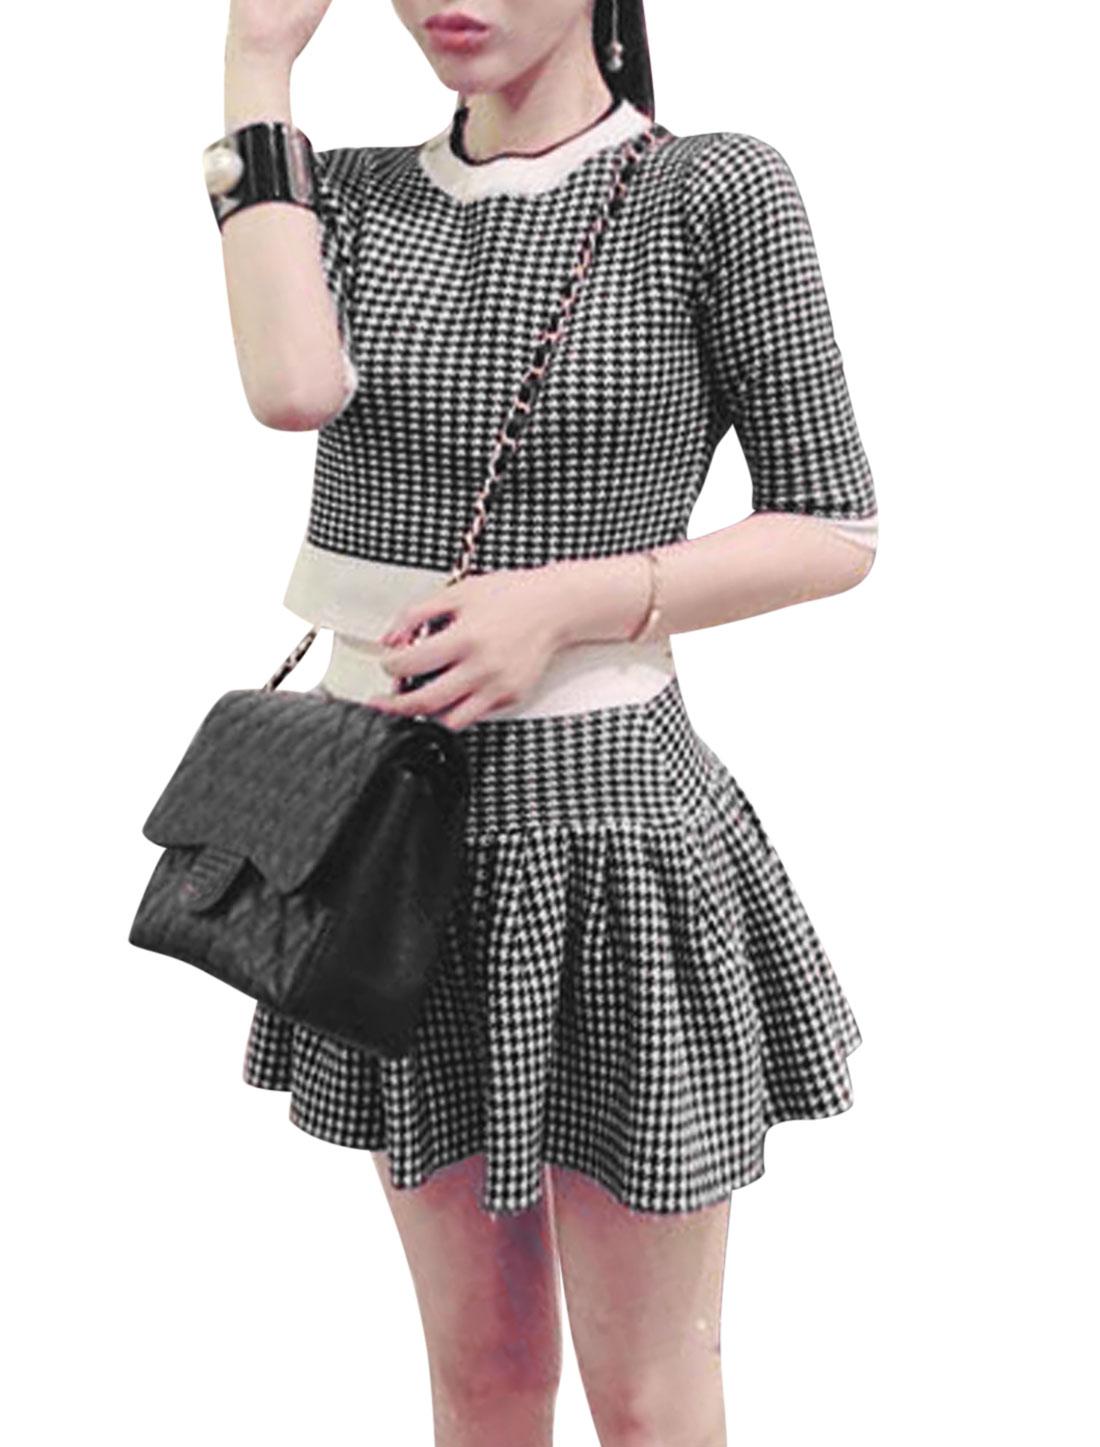 Women Crew Neck Houndstooth Pattern Top w Elastic Waist Skirt Sets Black White S